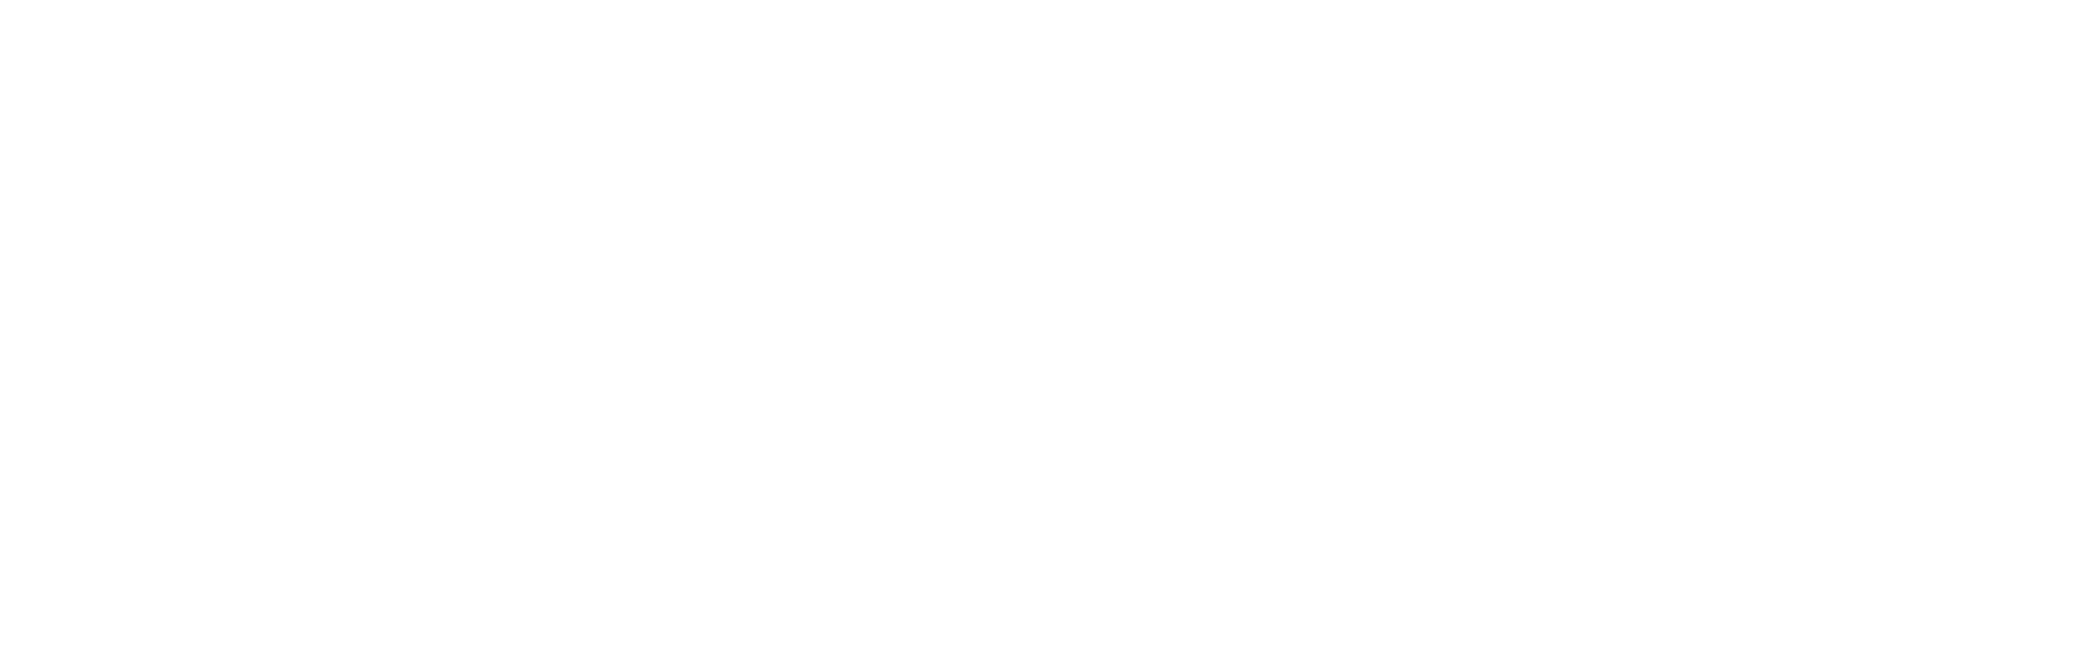 mupun design